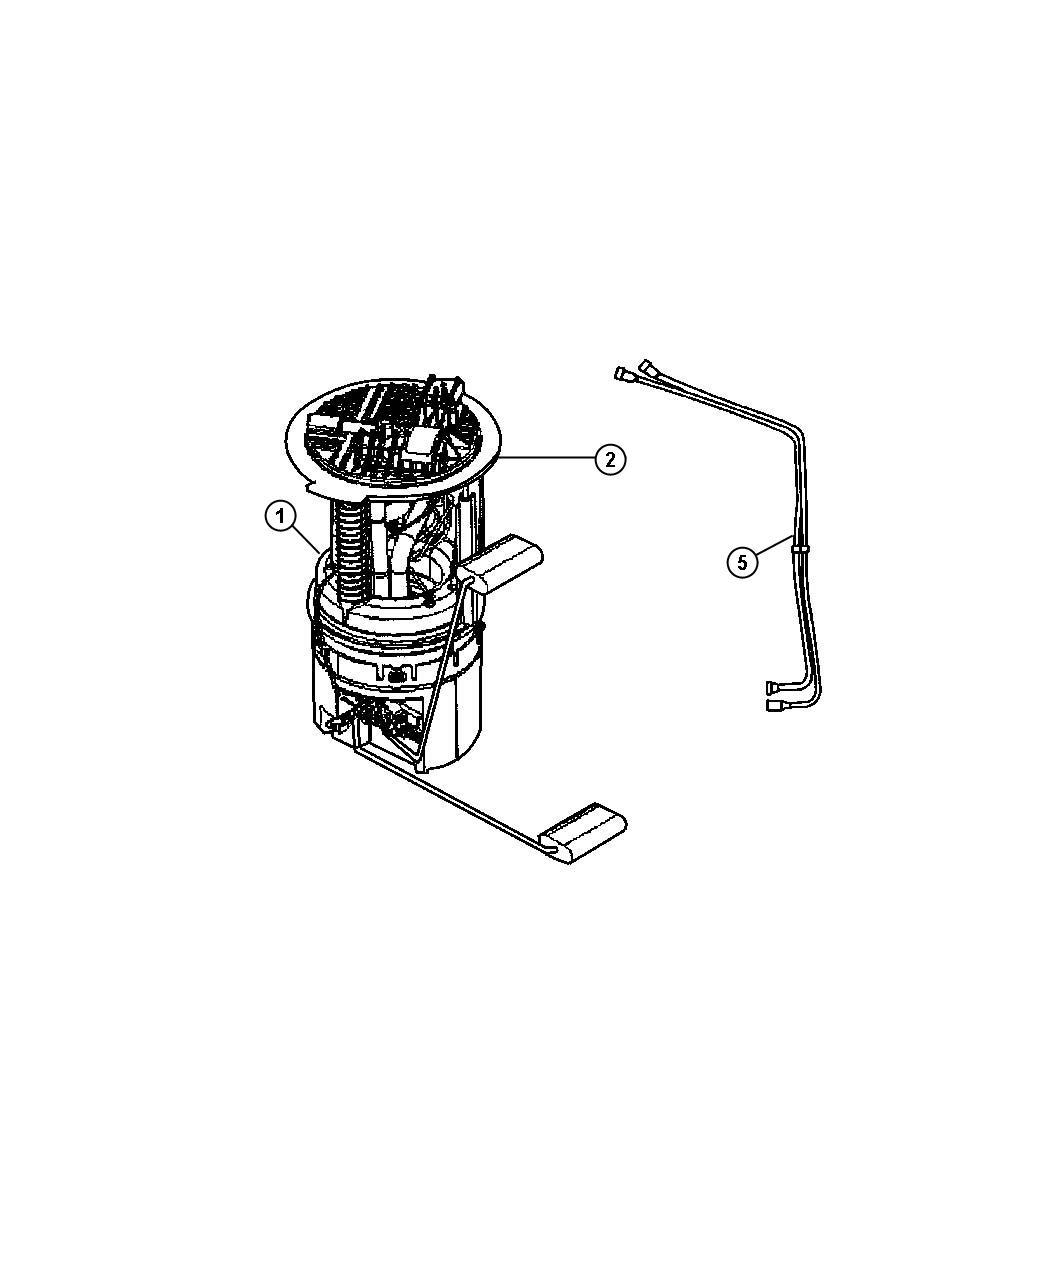 tags: #2005 f250 xl 4x4#f250 horn fuse#f250 turn signal relay#f250 horn  wiring#f250 starter relay#f250 glow plug relay#f250 alternator relay#f250  cooling